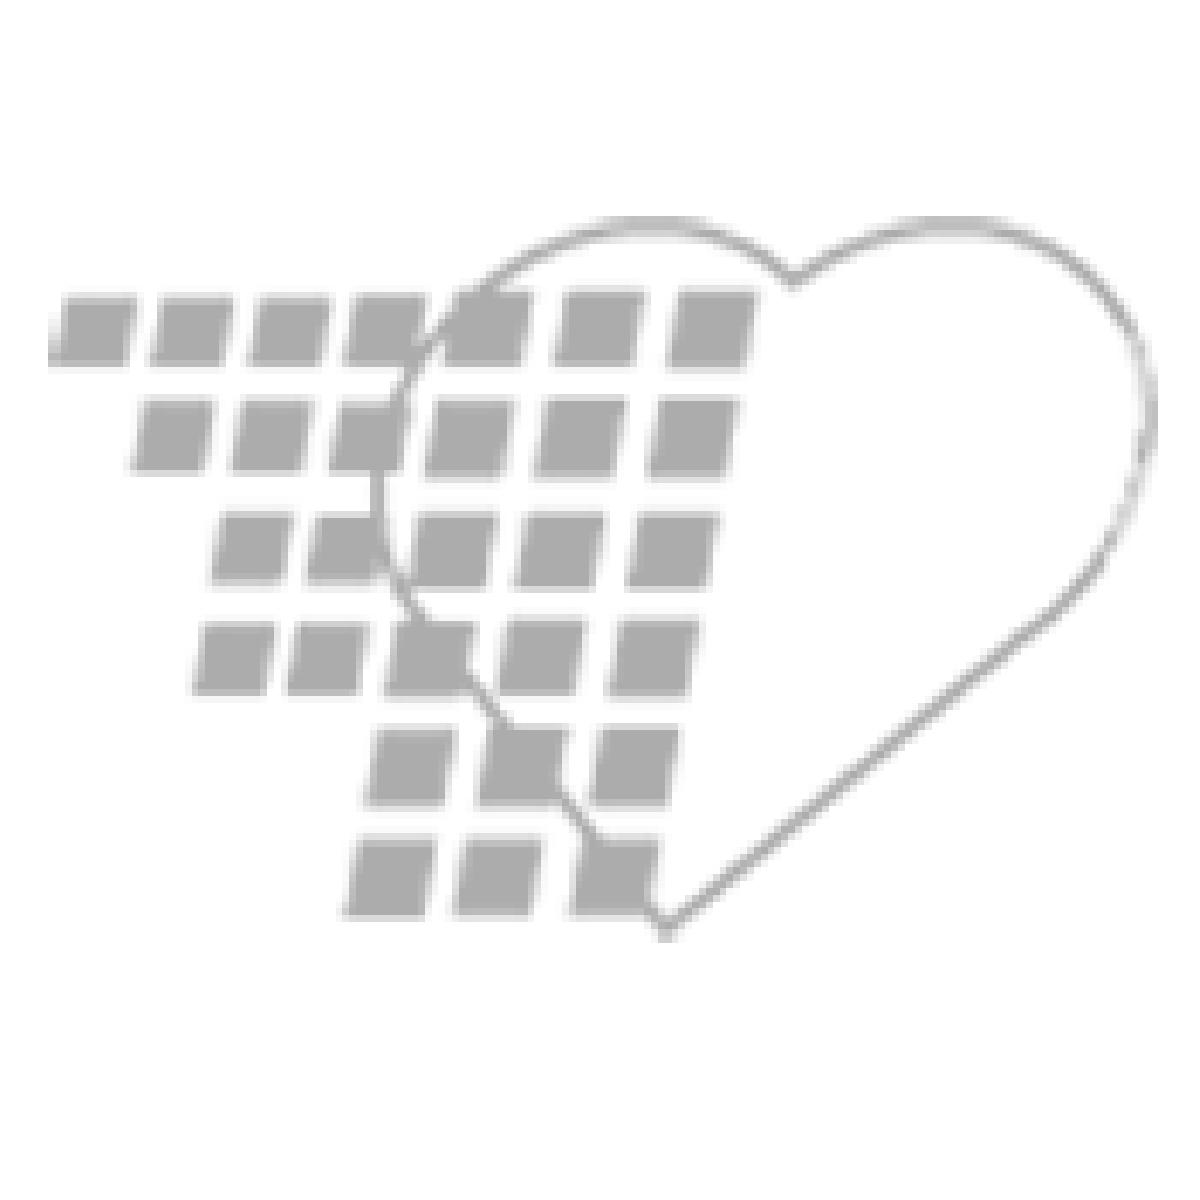 06-69-1300-16OZ - Pocket Nurse® Plastic Ointment Jar wit Lid - 16oz